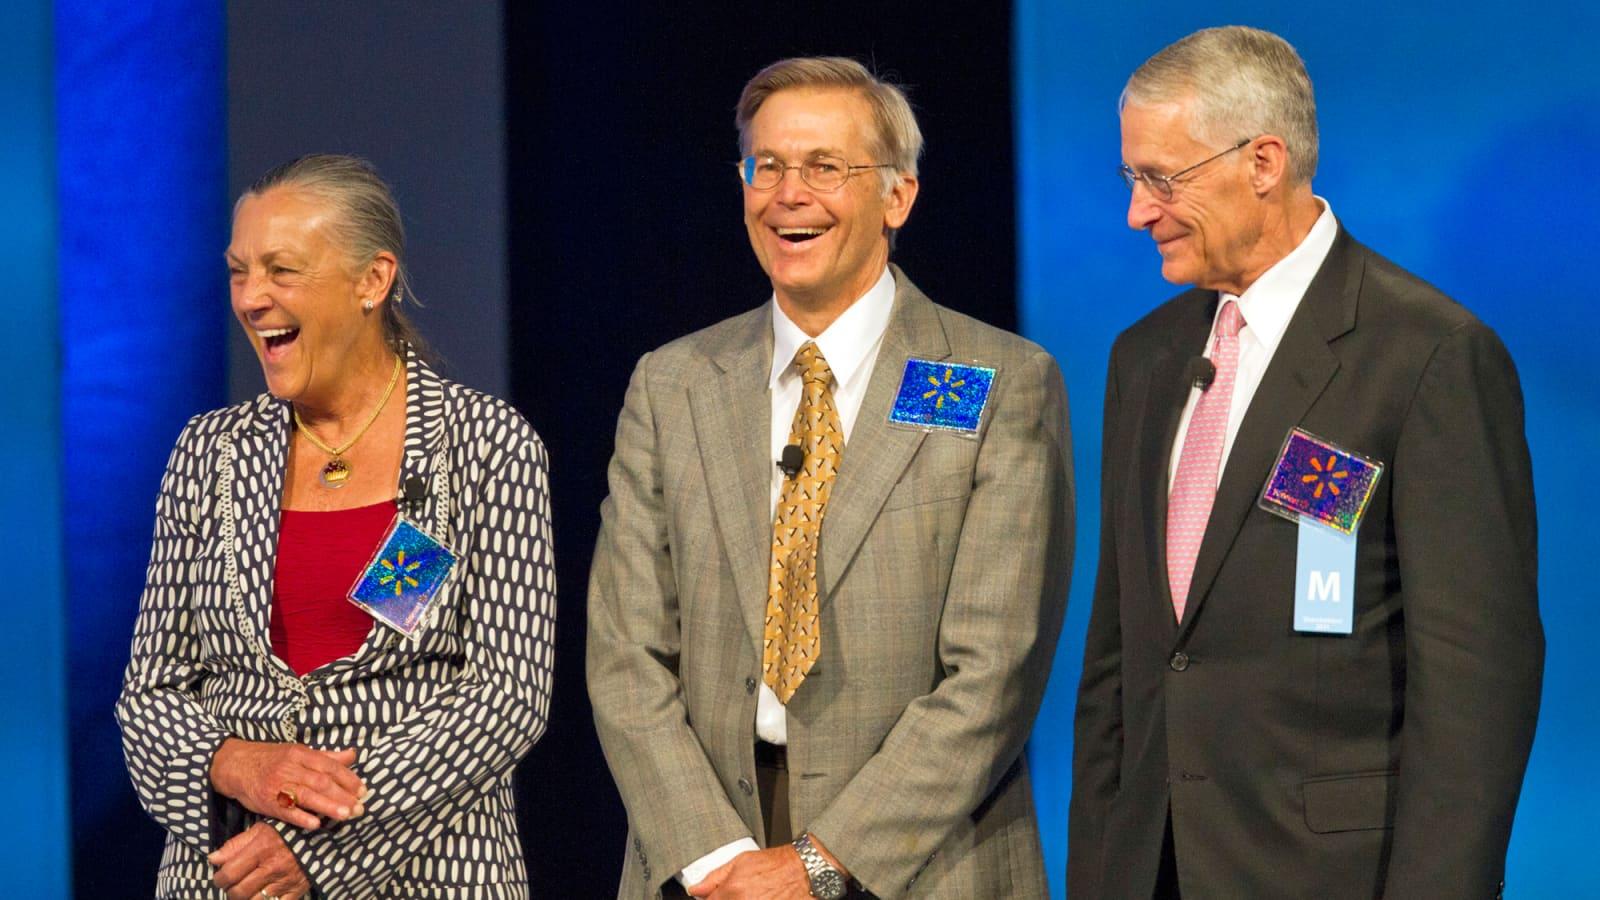 The Walton family is worth more than Jeff Bezos or Bill Gates